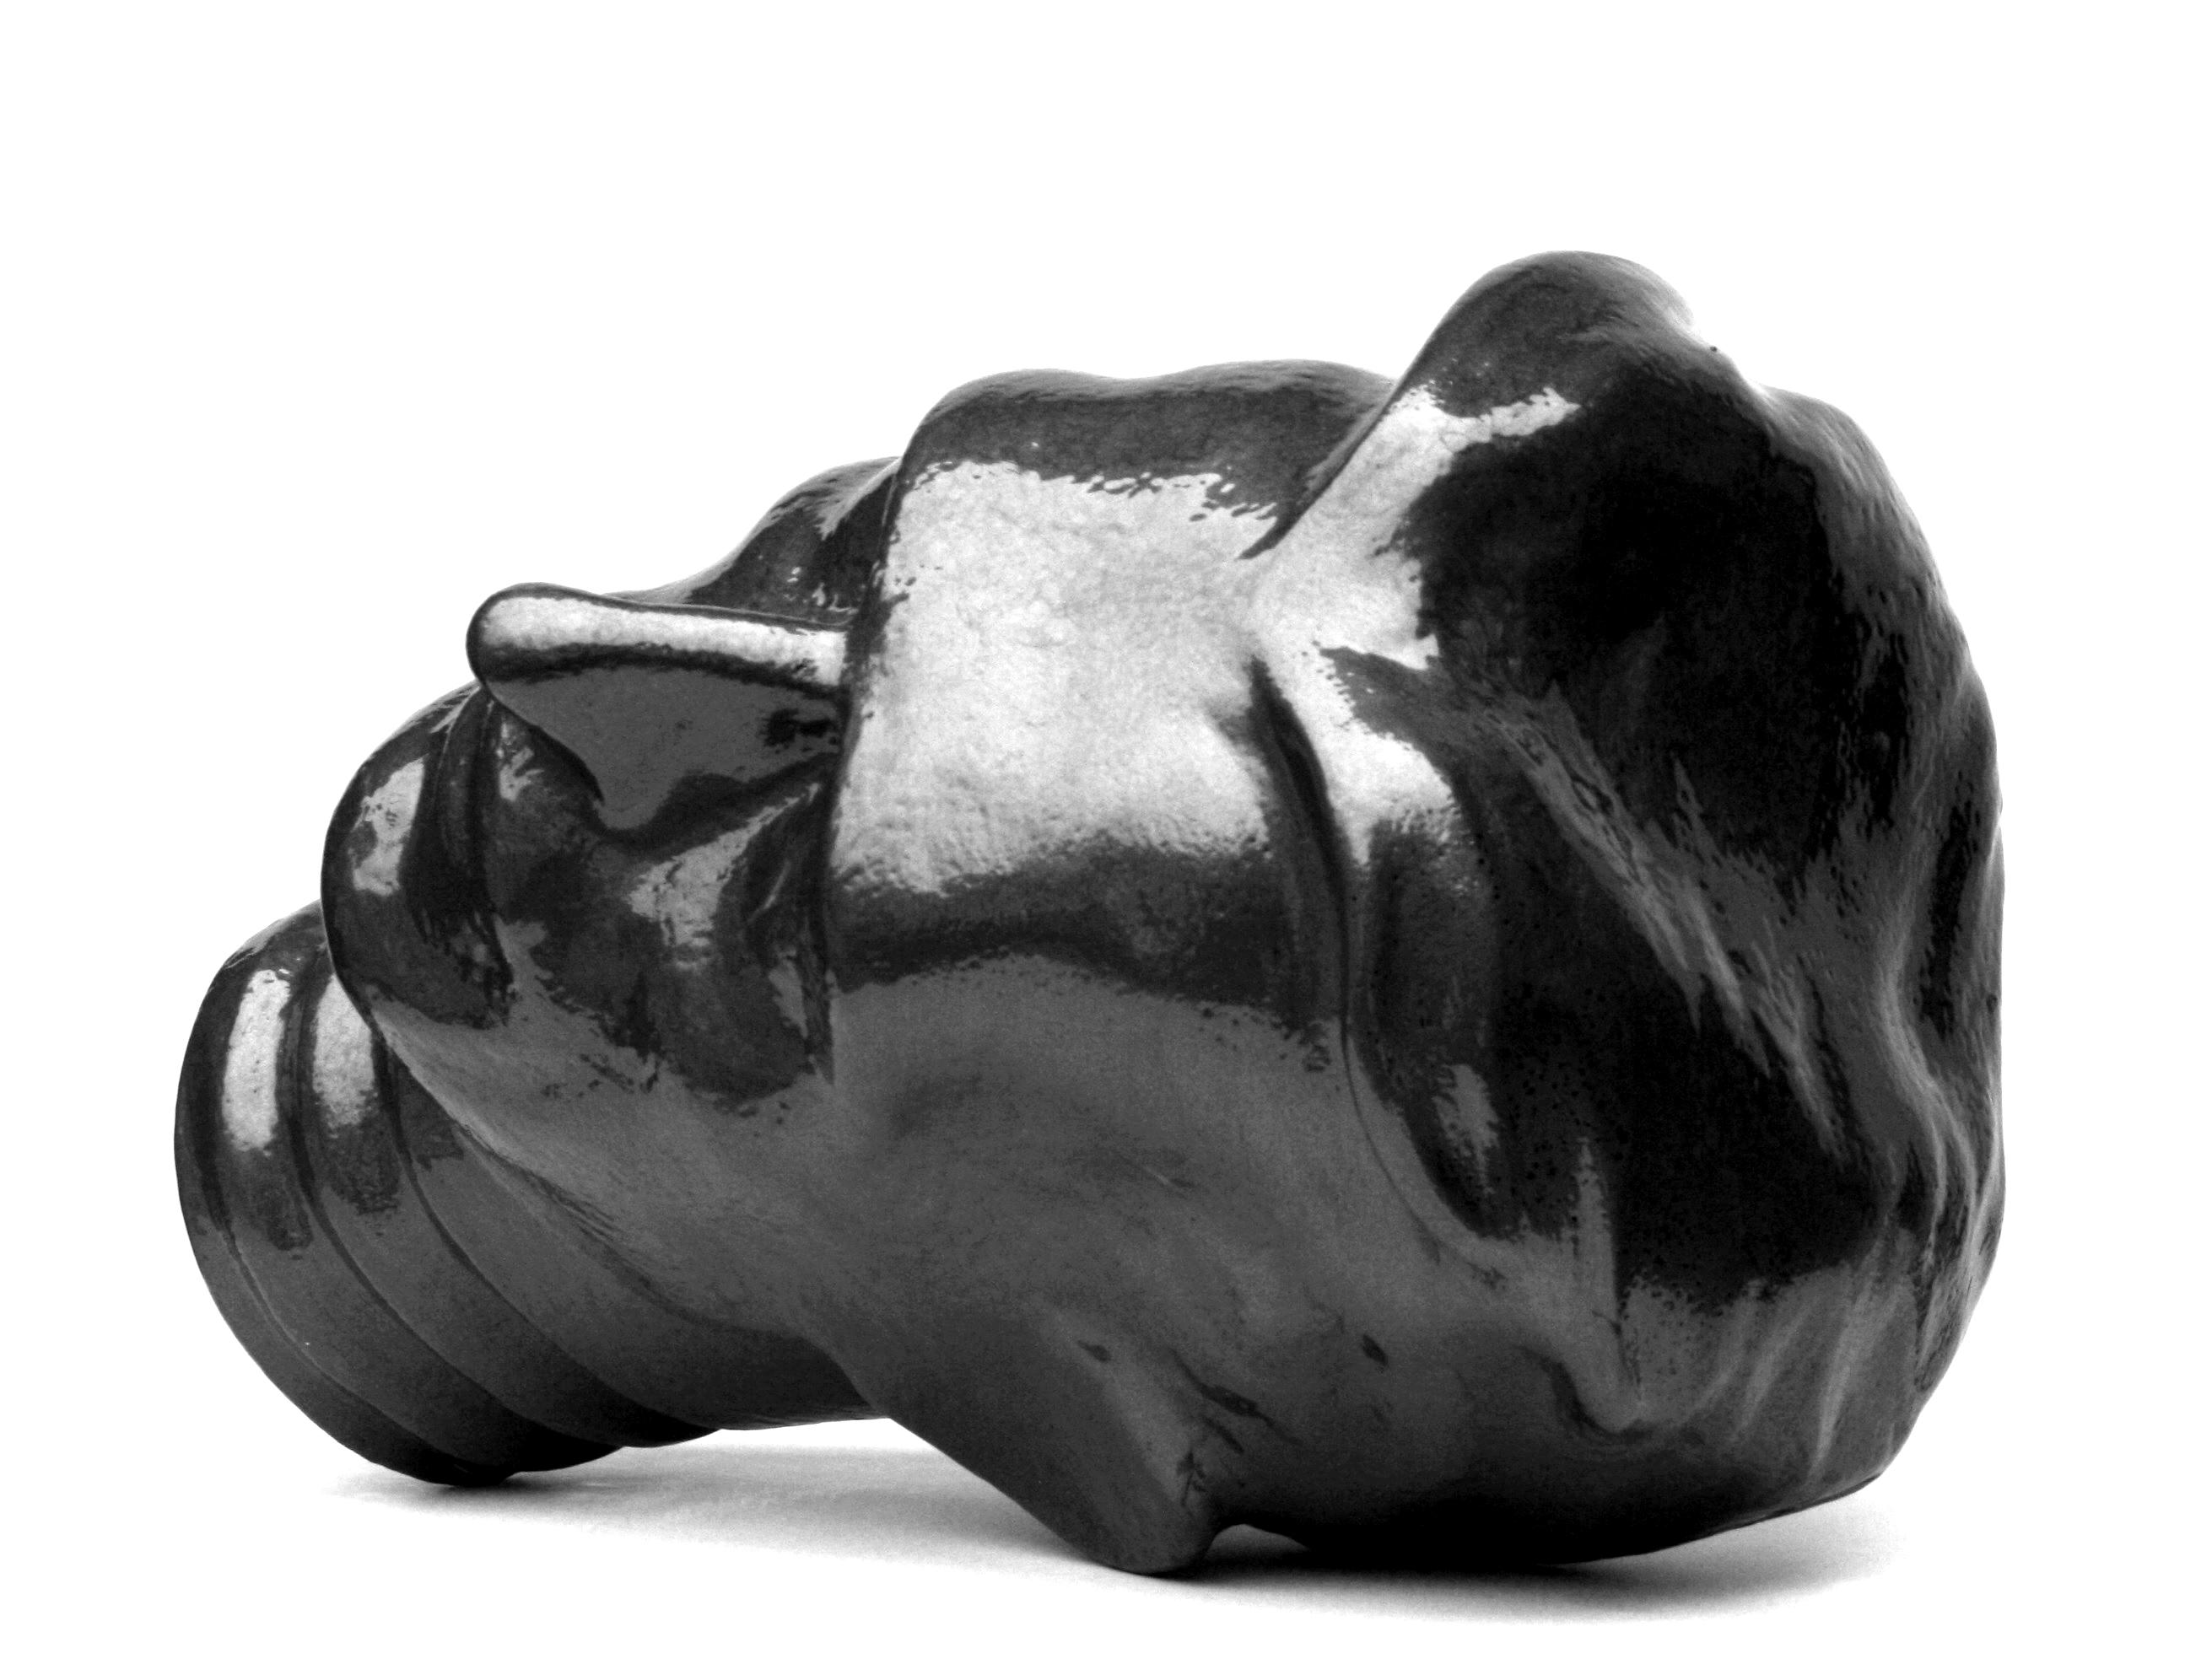 TESLA BULB, ACRYSTAL MODEL FOR BRONZE, 25X30X45CM 2016 (4)